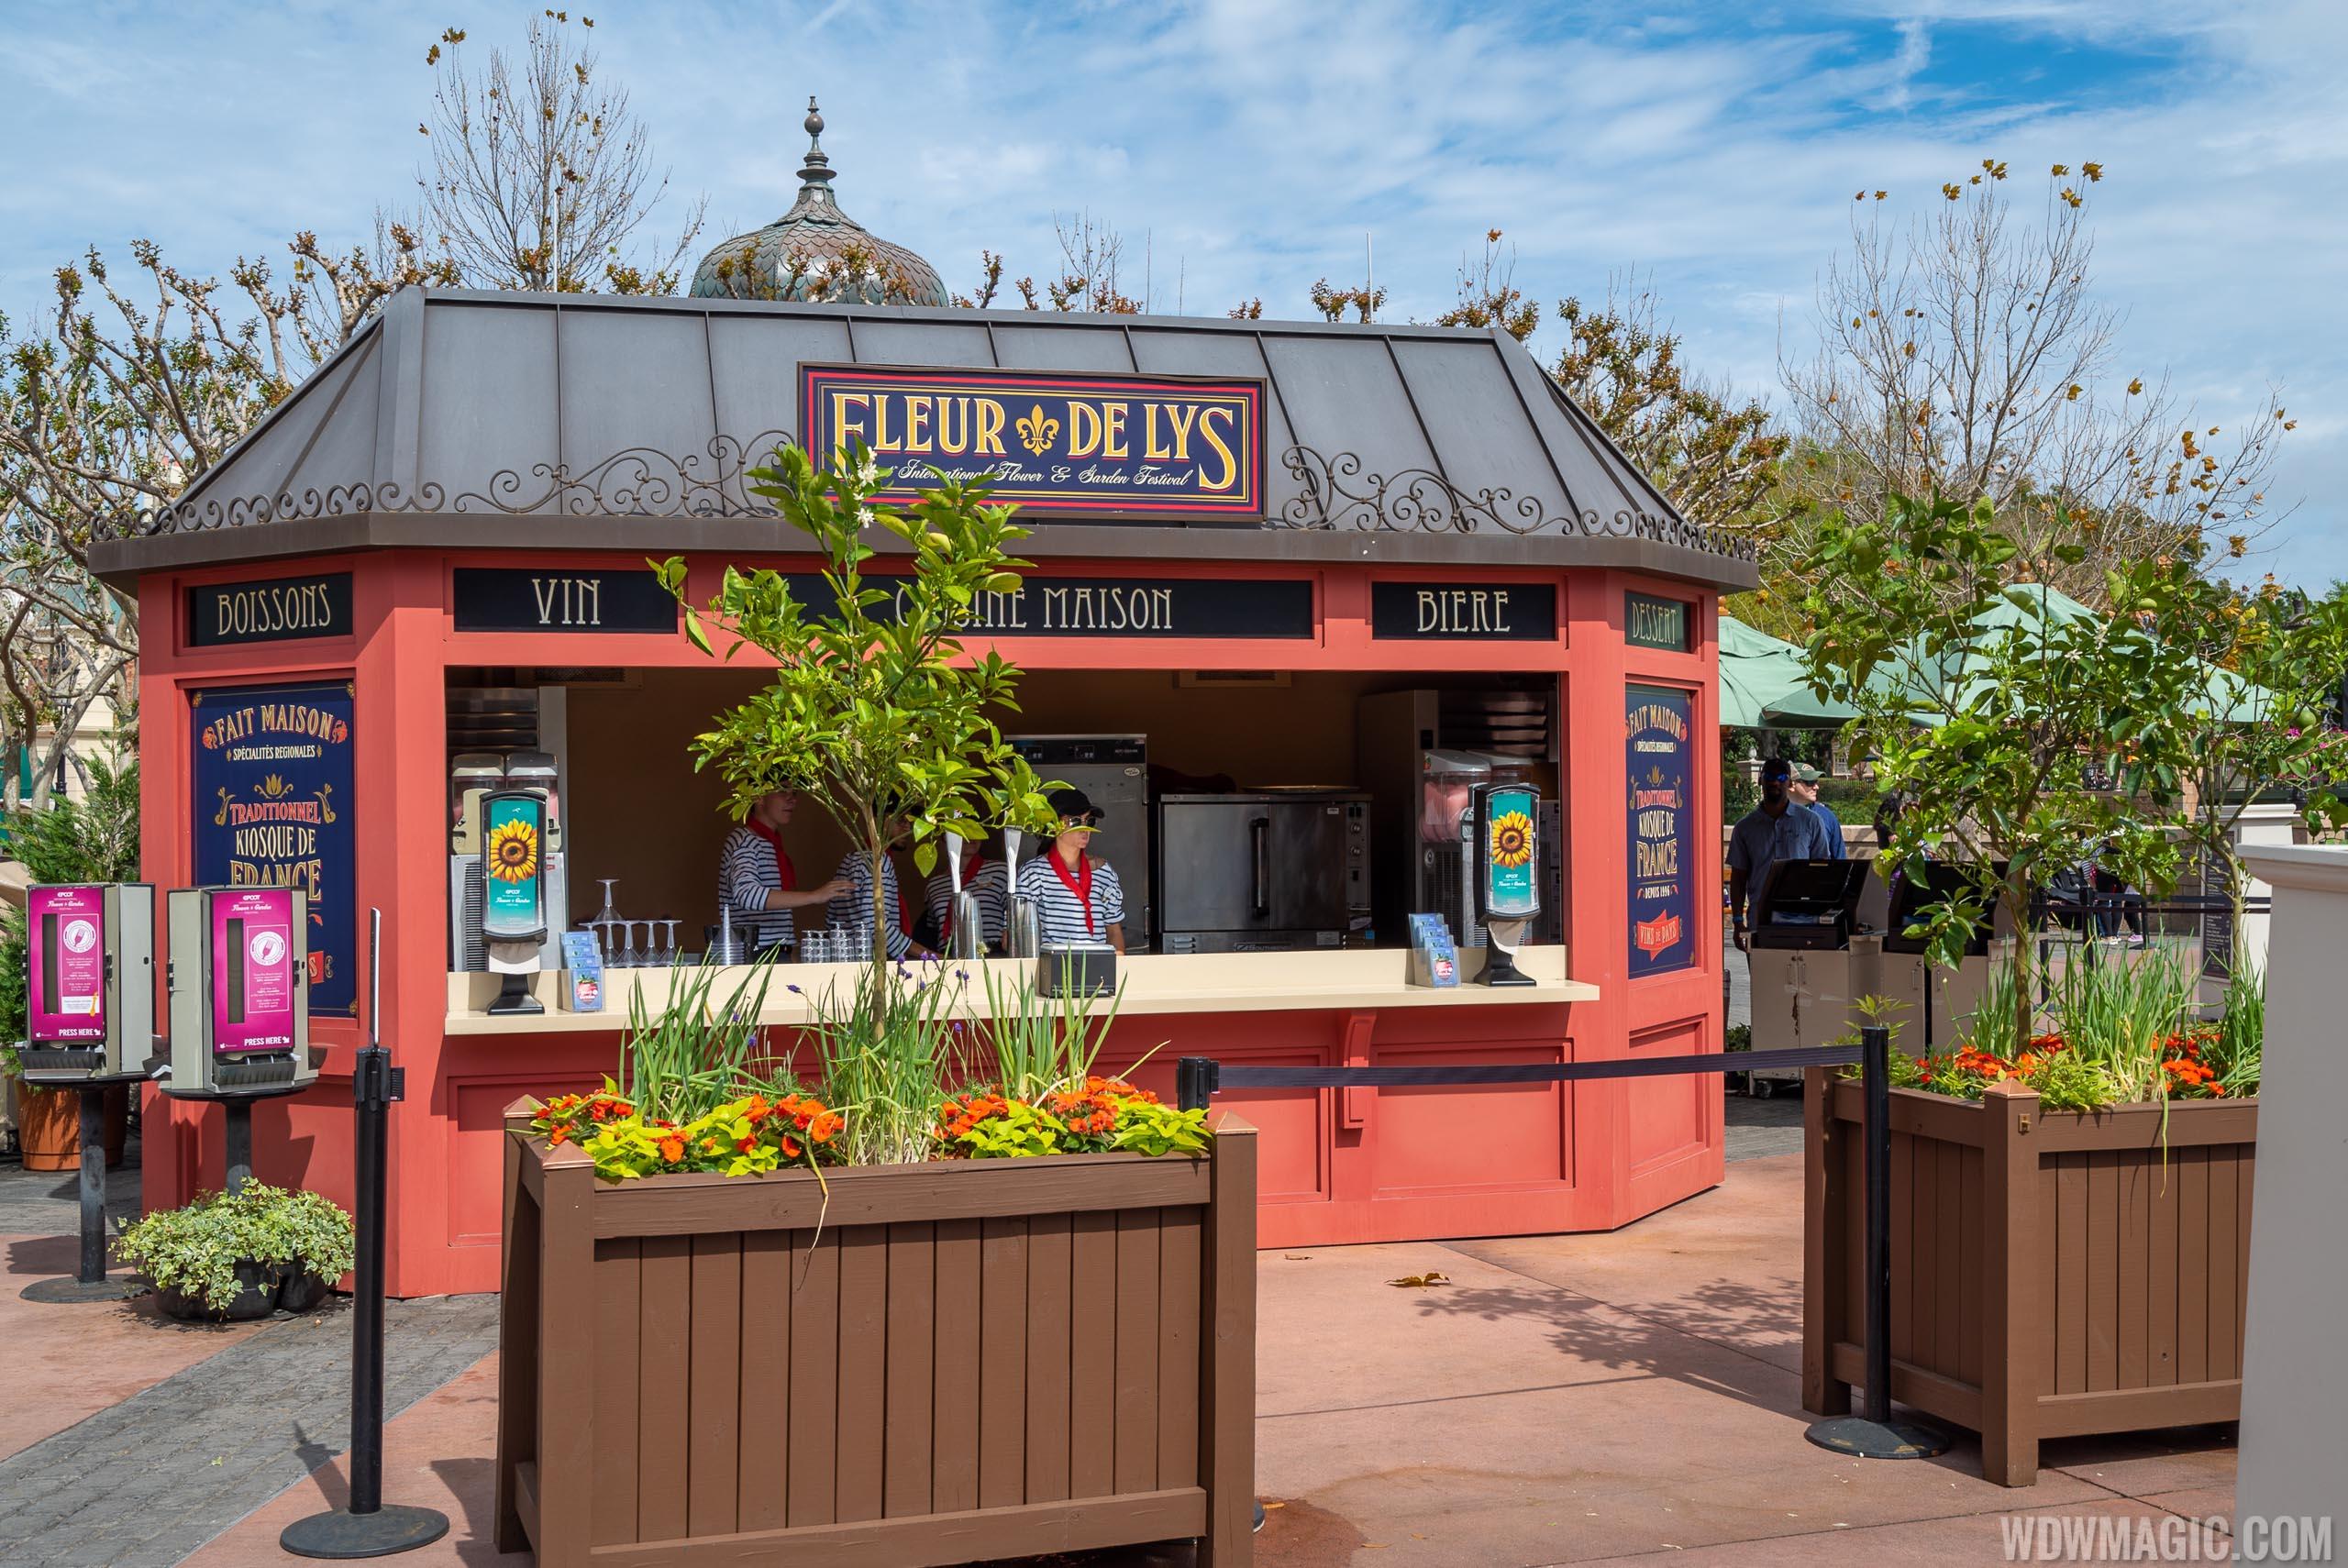 2020 Epcot Flower and Garden Festival Outdoor Kitchen kiosks - Fleur De Lys